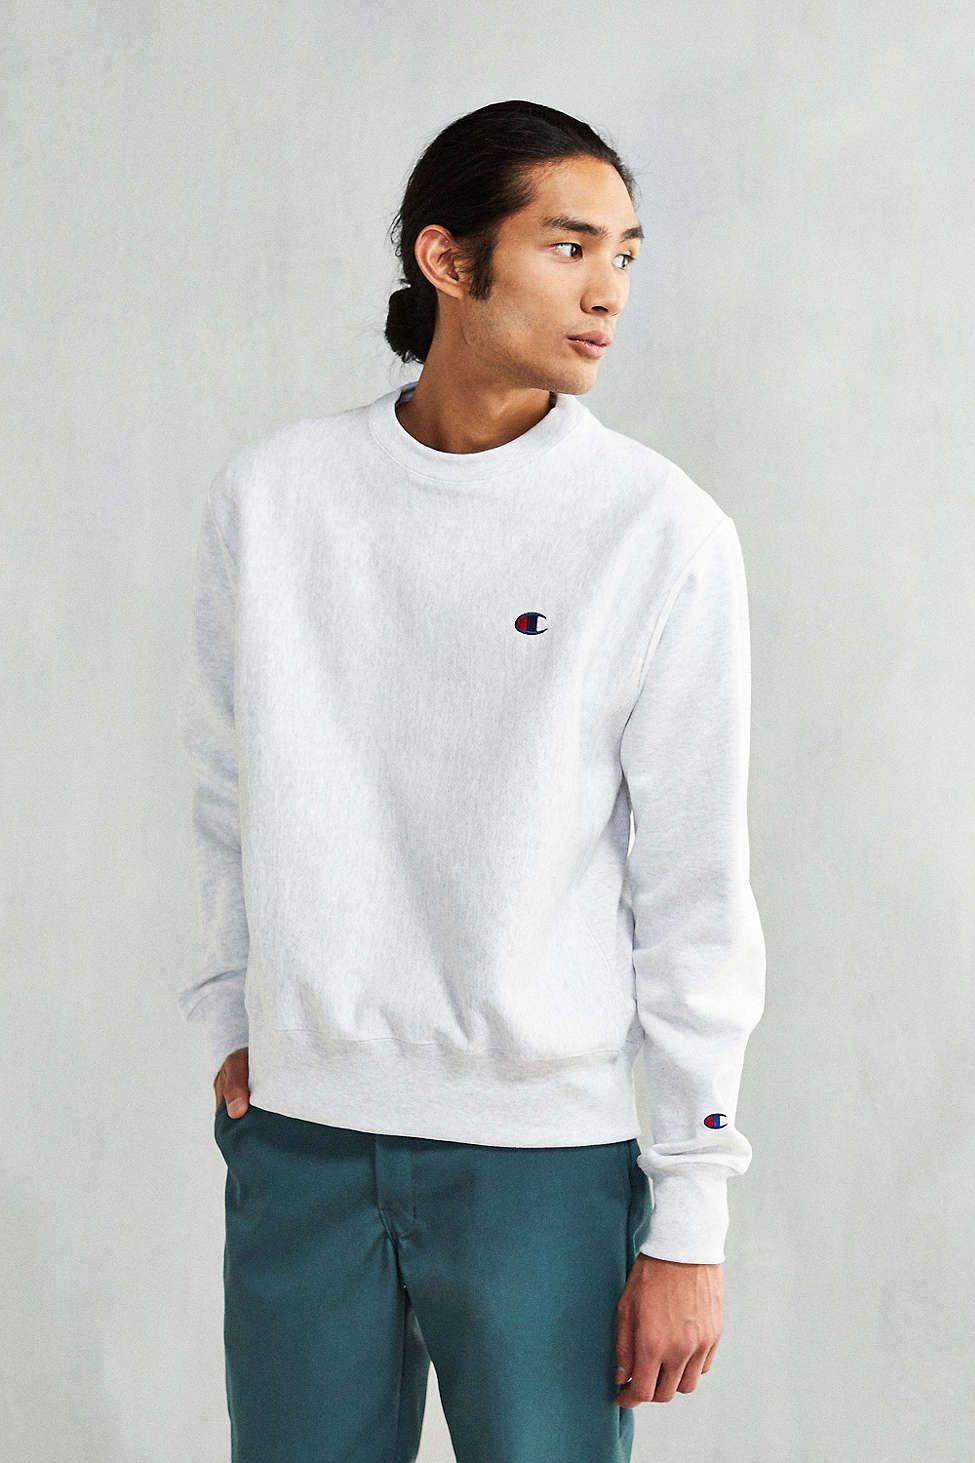 Predownload: Champion Reverse Weave Crew Neck Sweatshirt Sweatshirts Crew Neck Sweatshirt Long Sleeve Tshirt Men [ 1463 x 975 Pixel ]